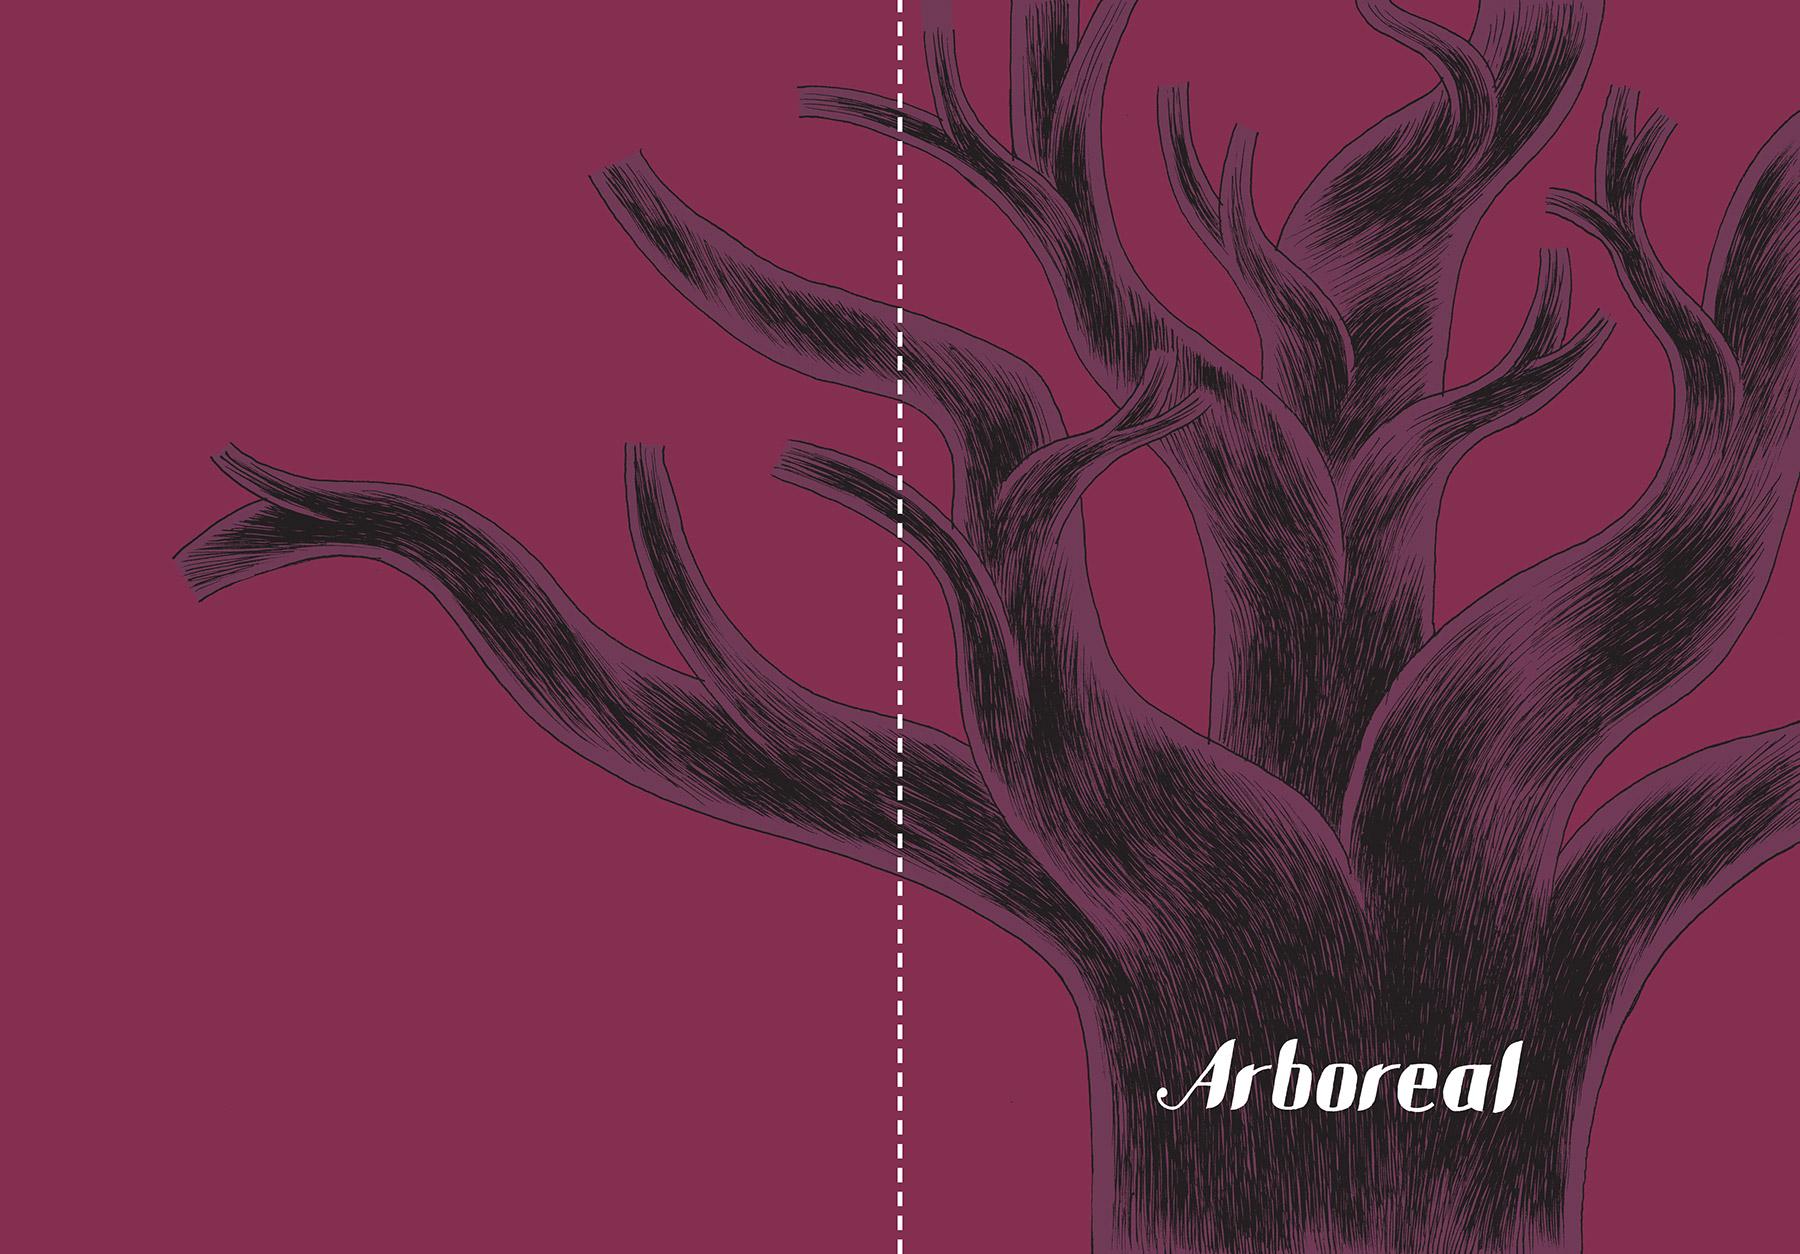 davidm-arboreal-web-cover_burgundy.jpg